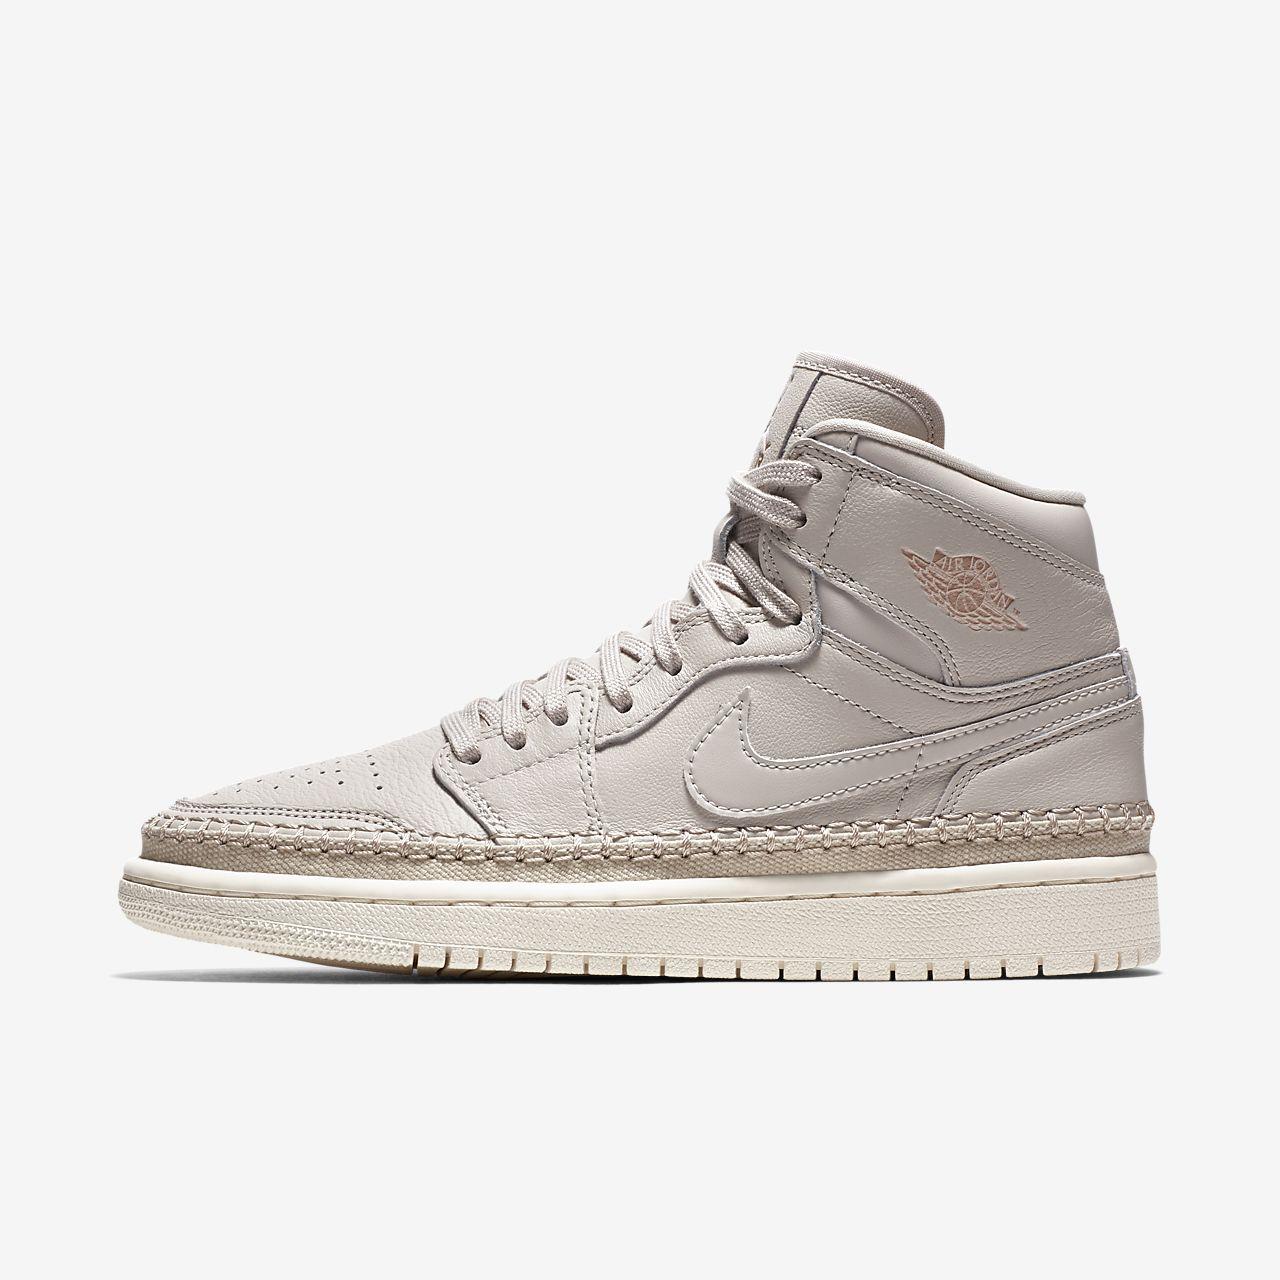 save off f5df0 75af3 ... Scarpa Nike Air Jordan 1 Retro High Premium - Donna